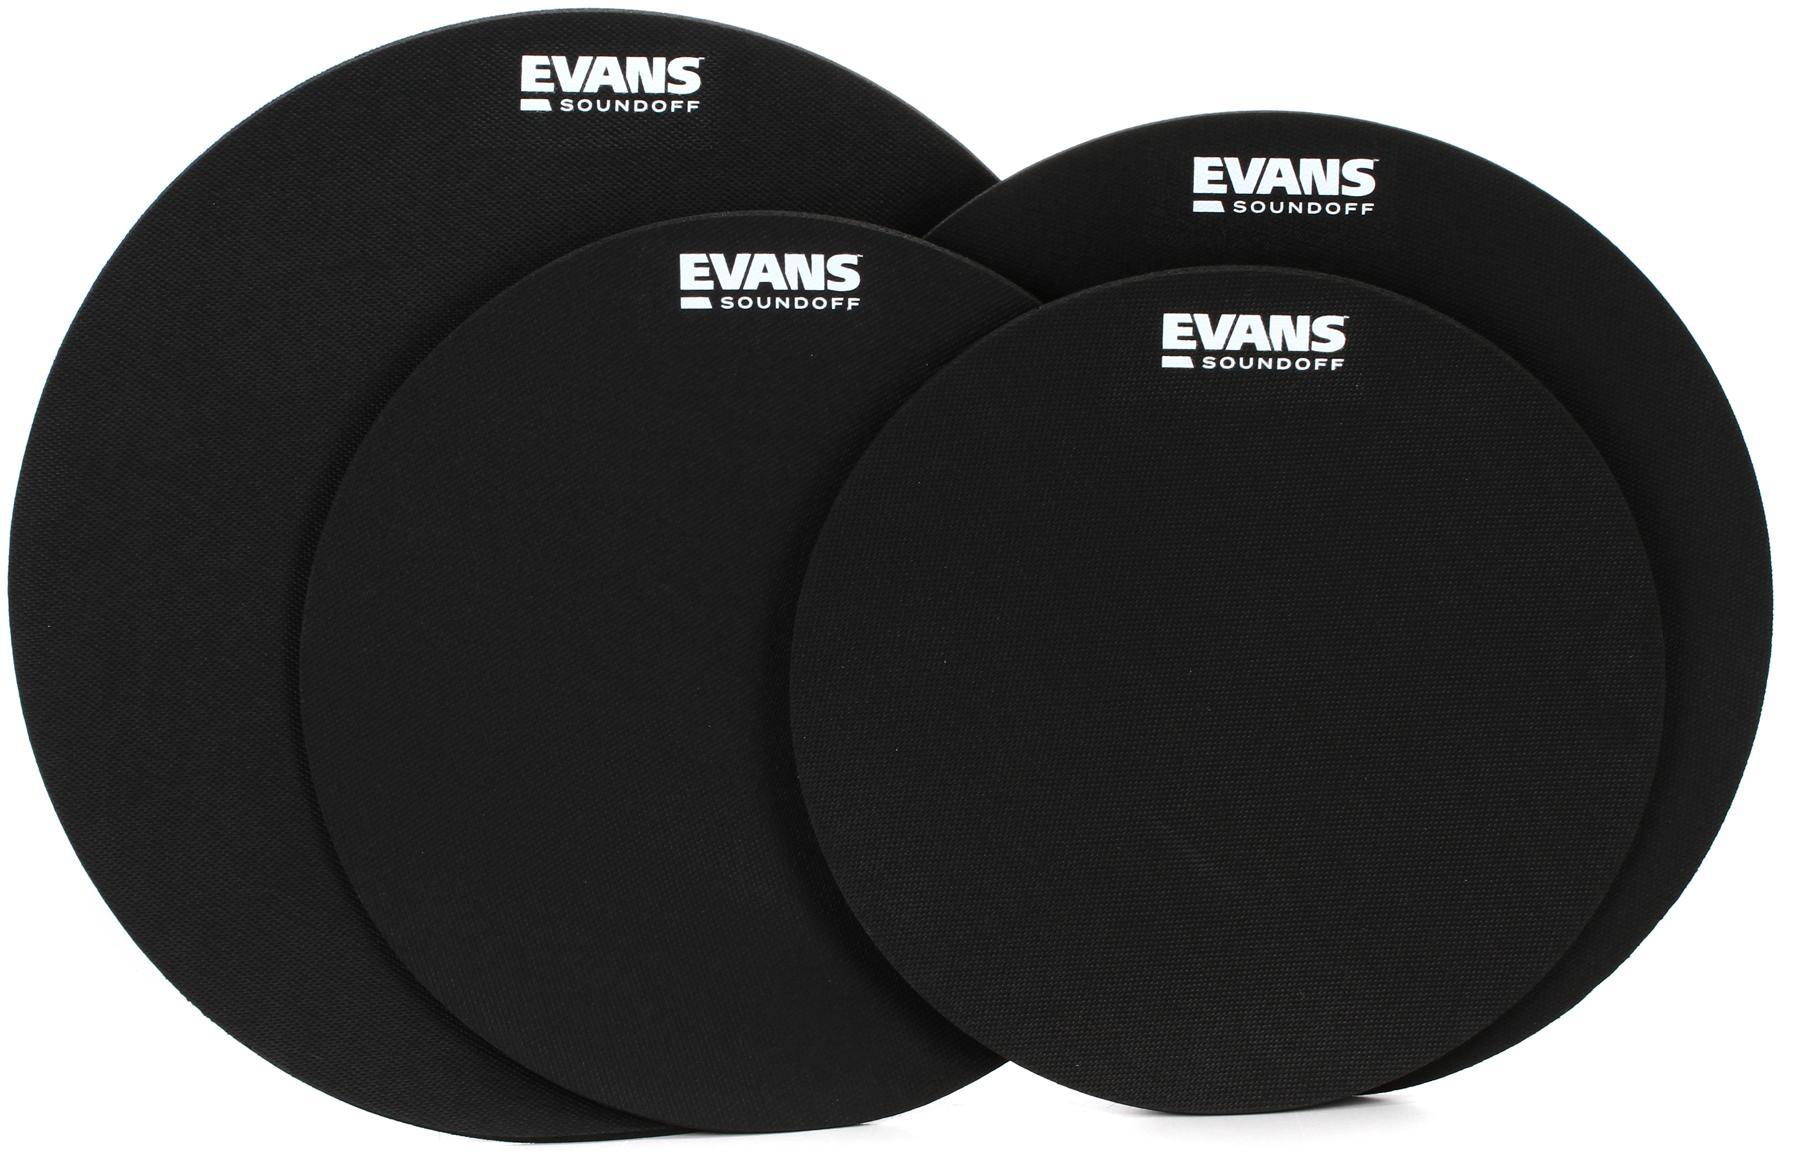 1. SoundOff by Evans Full Box Set